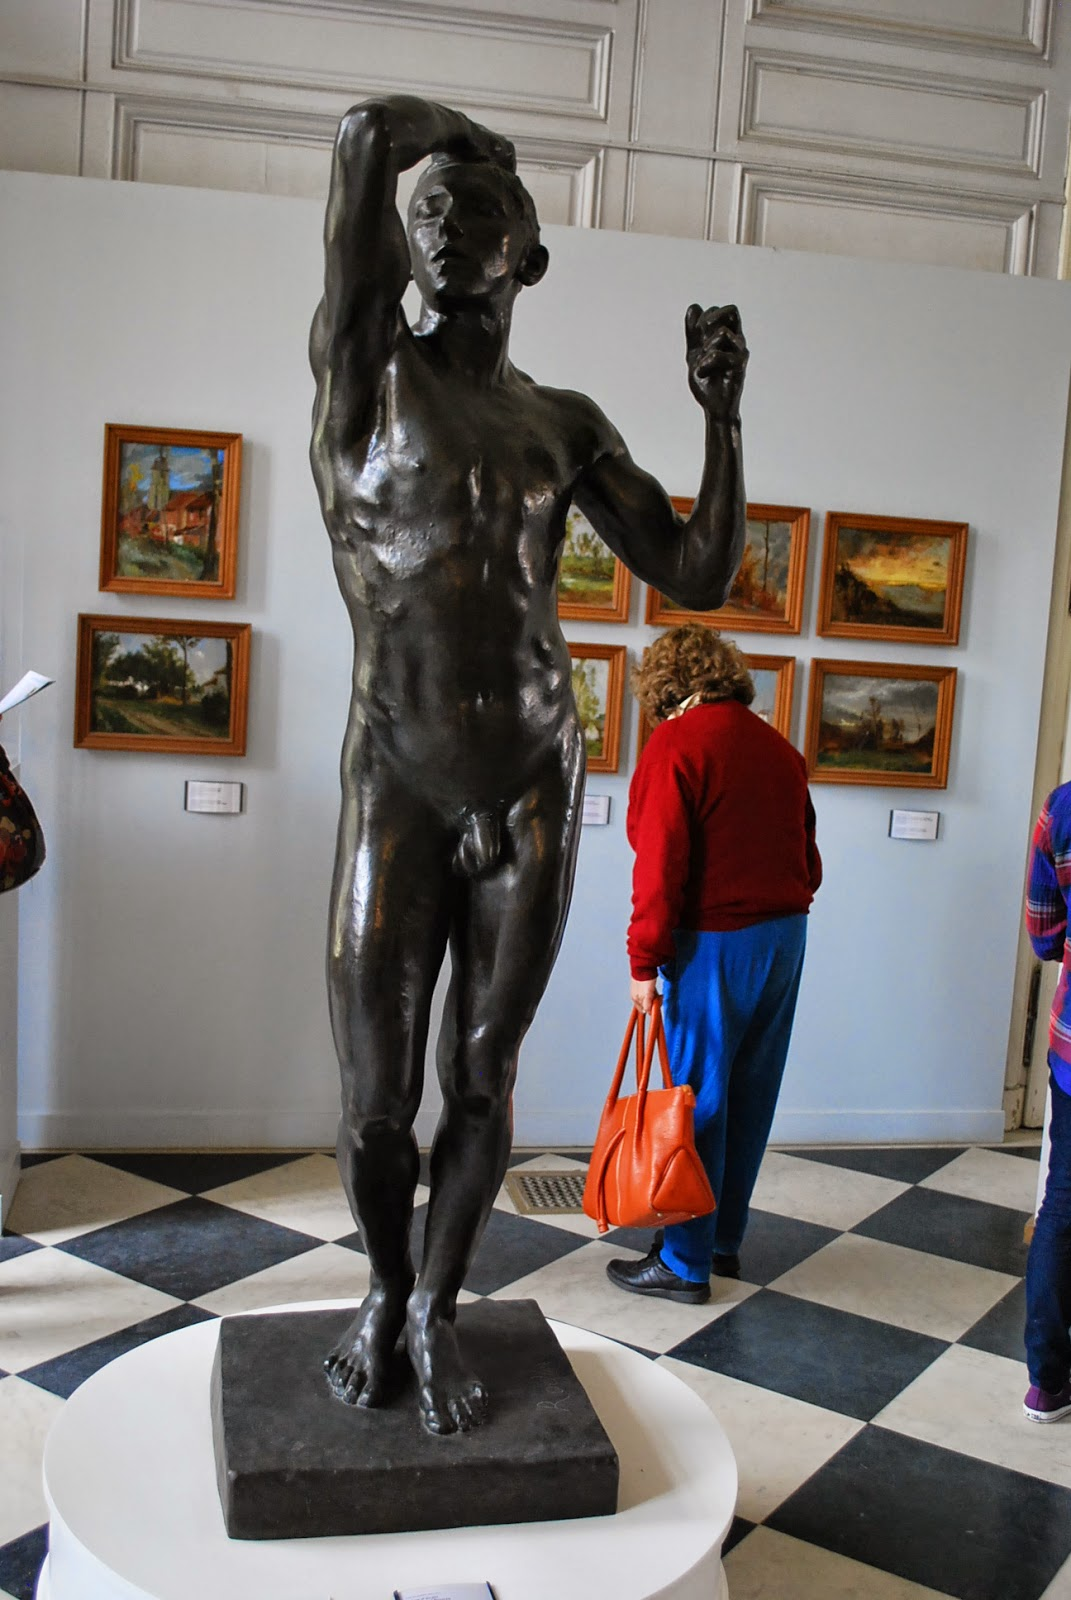 Rodin, L'âge d'airain